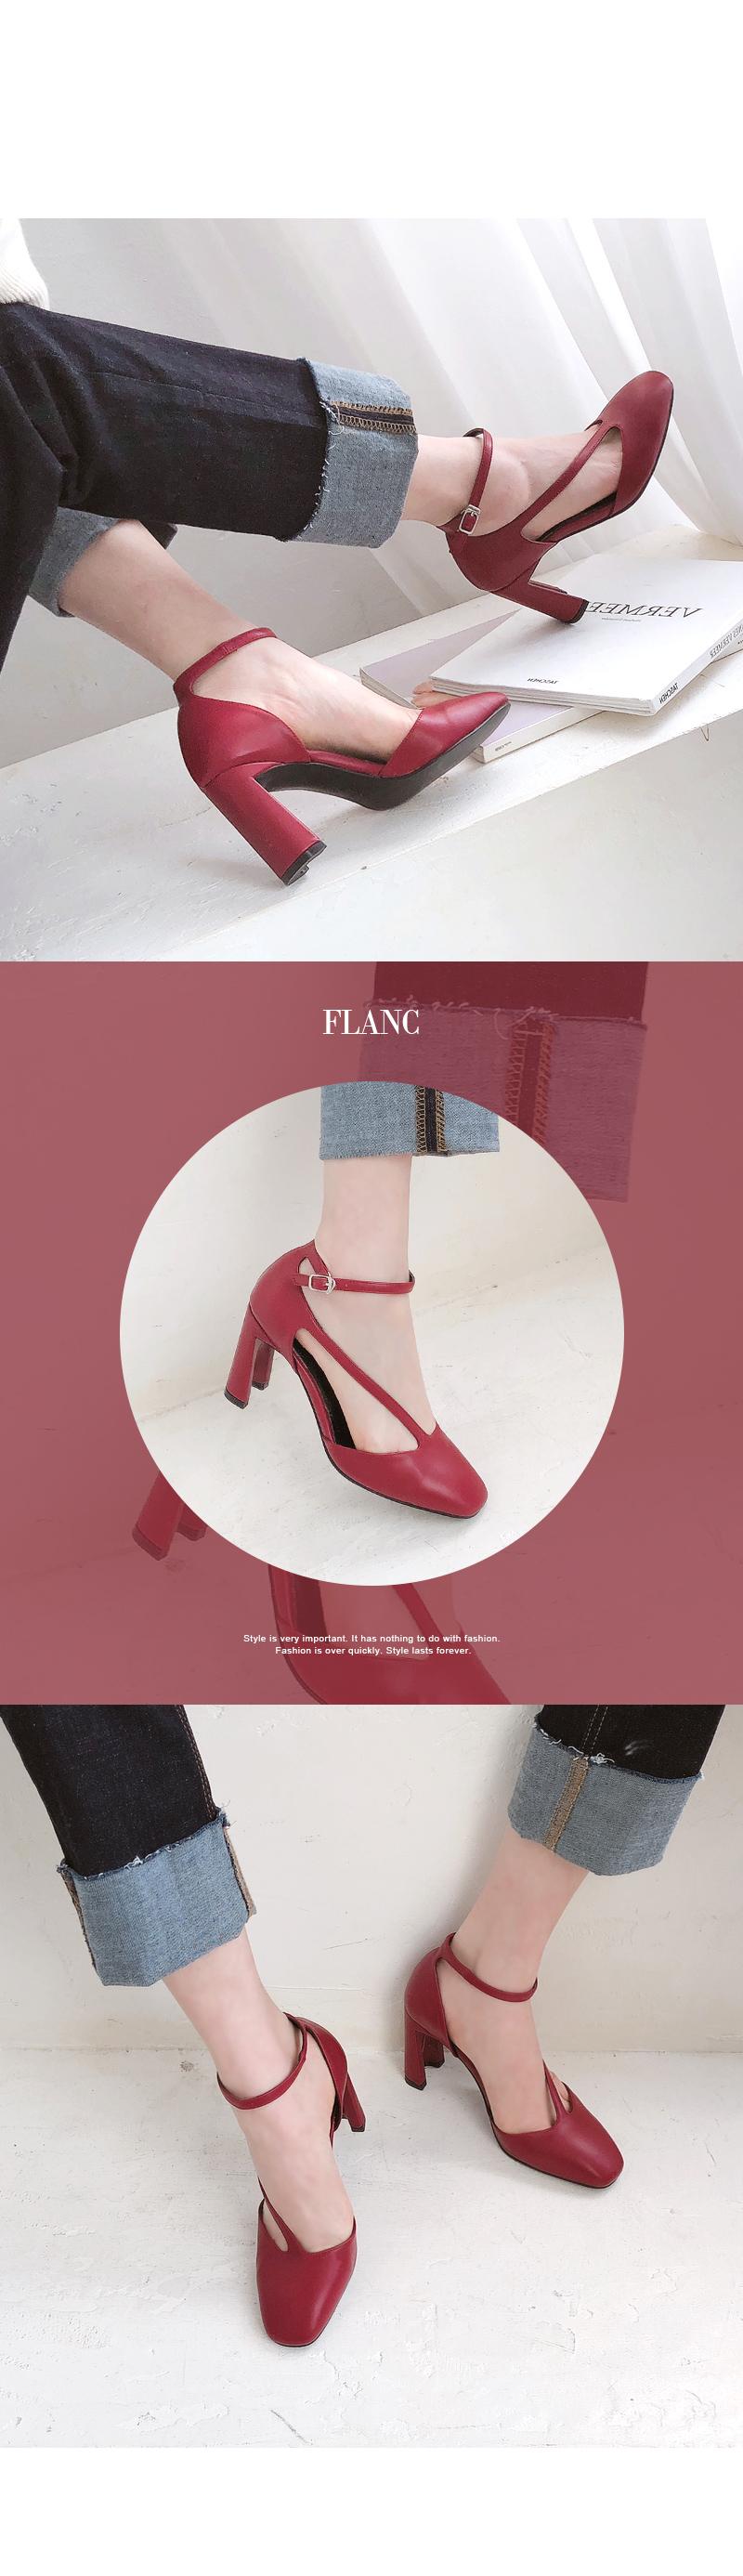 Planck 8.5cm